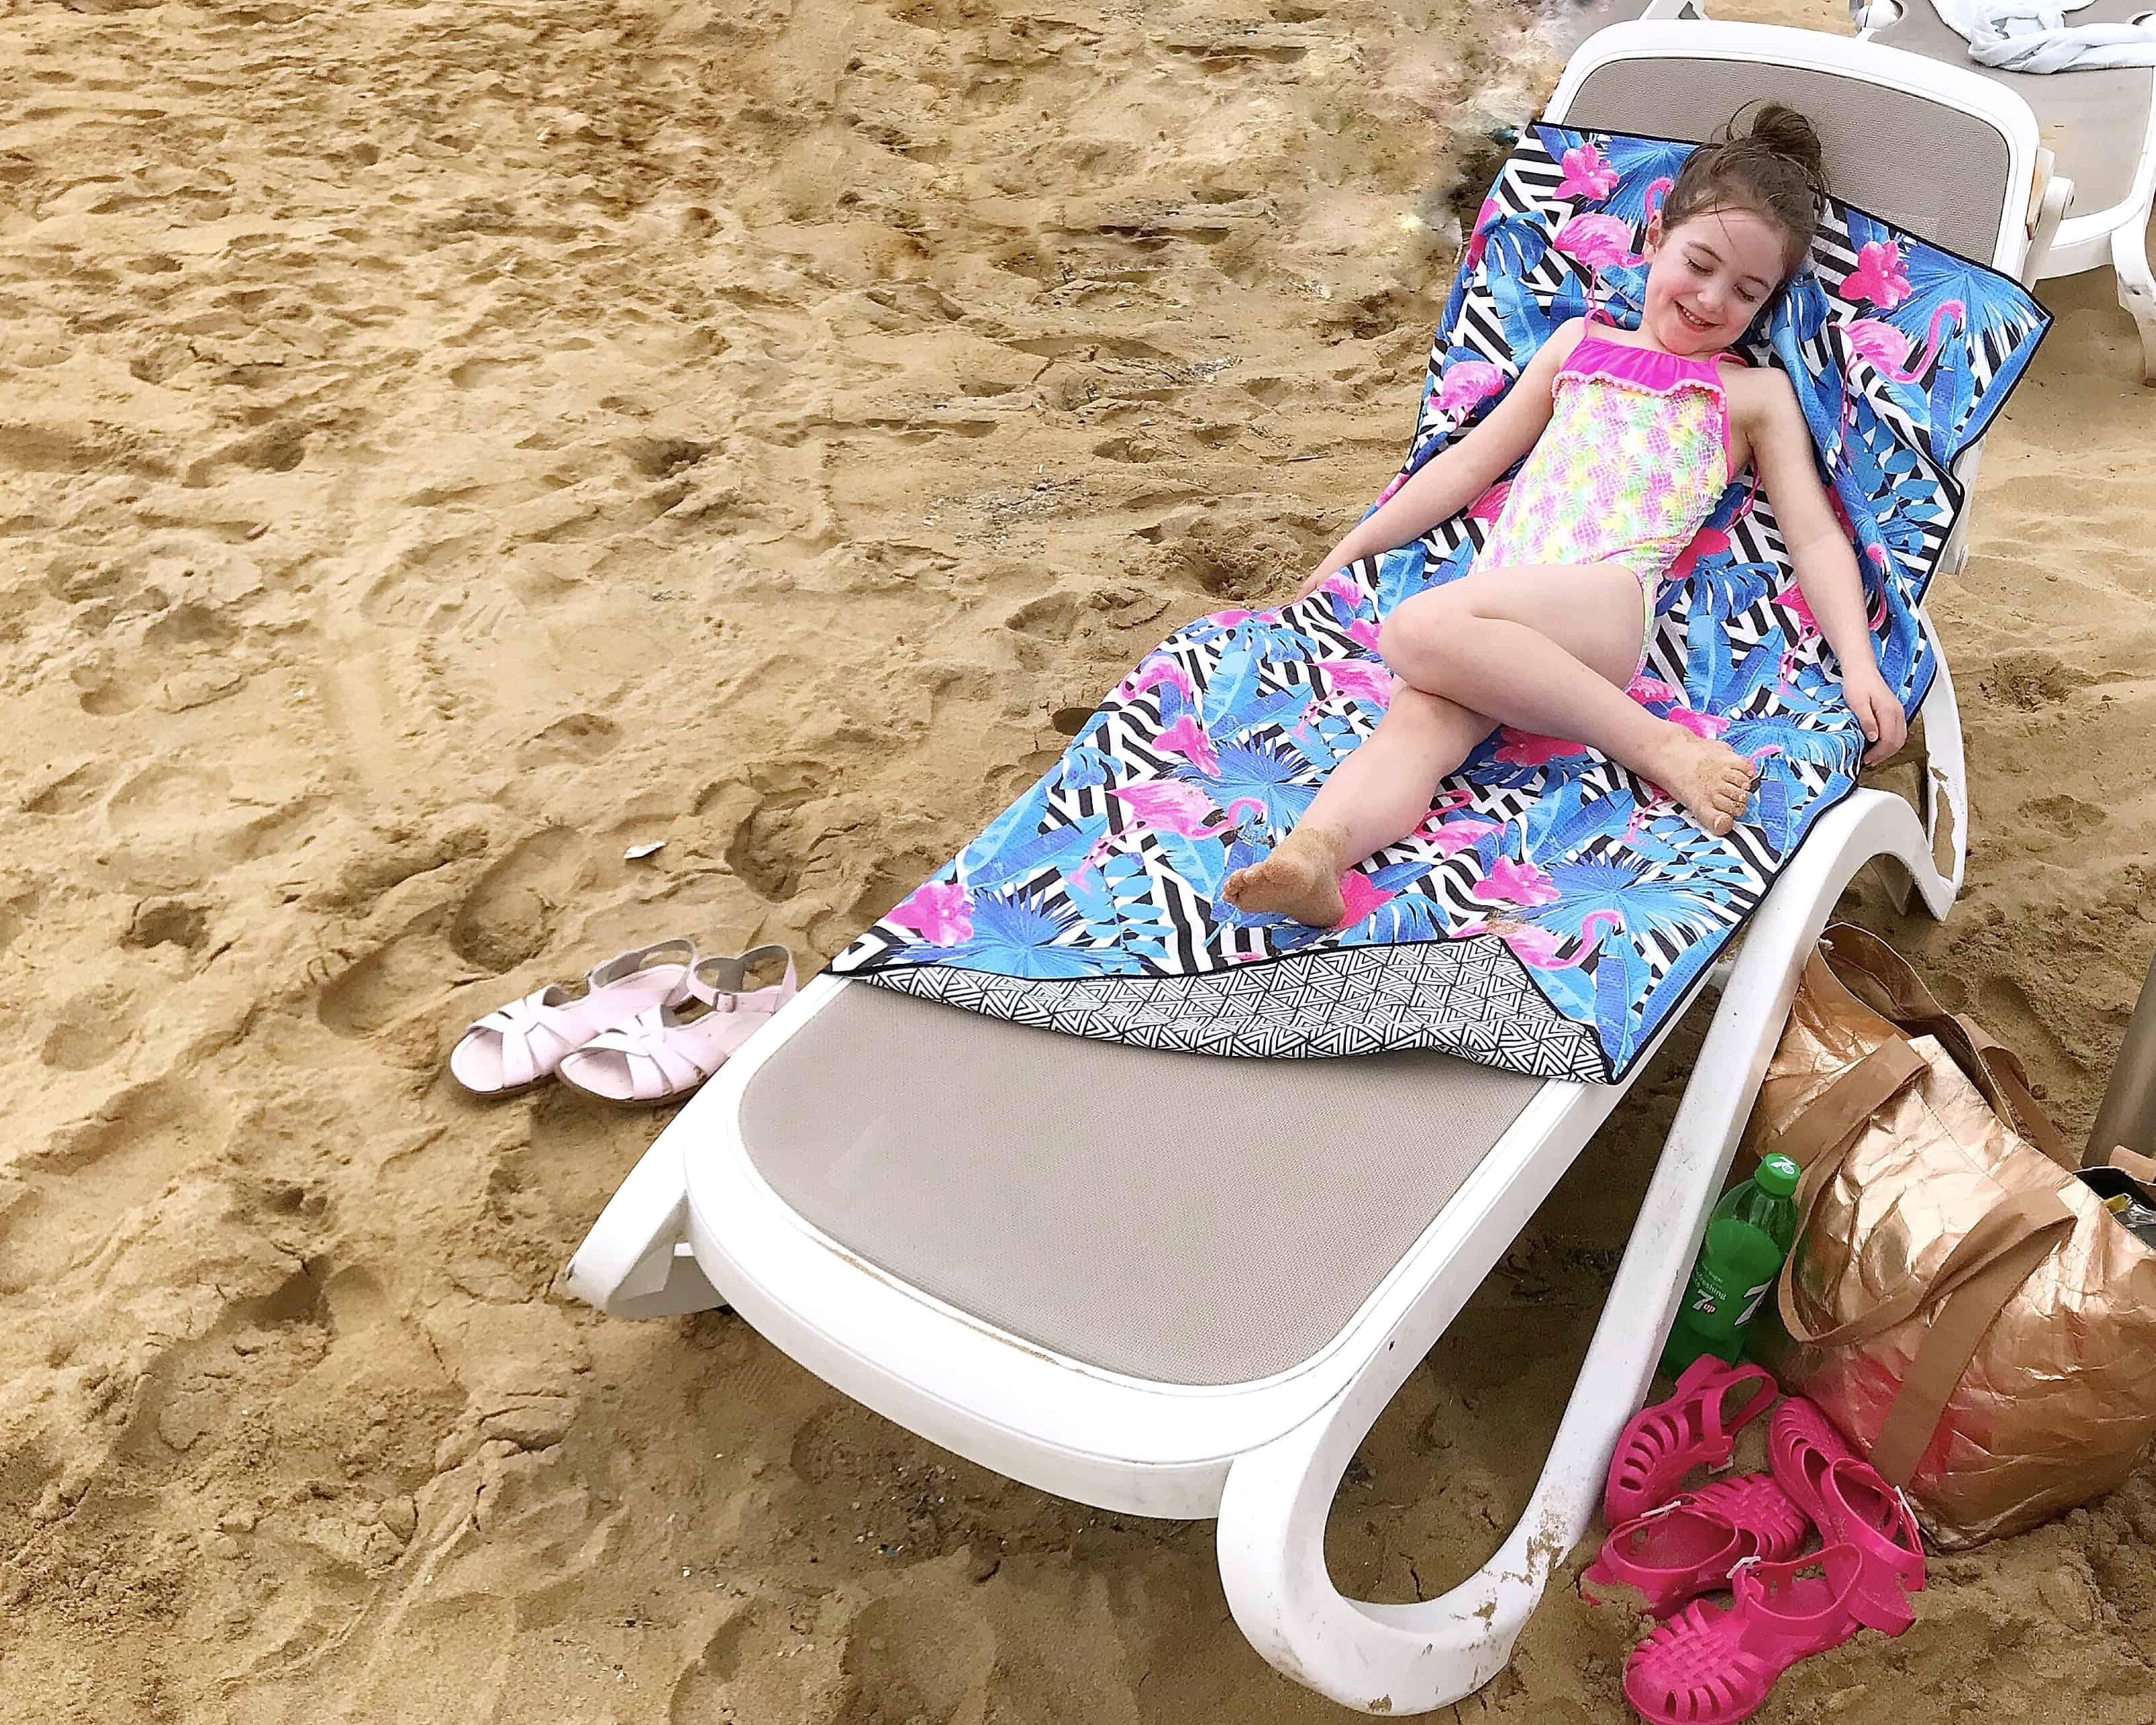 Tesalate sand-free beach towel